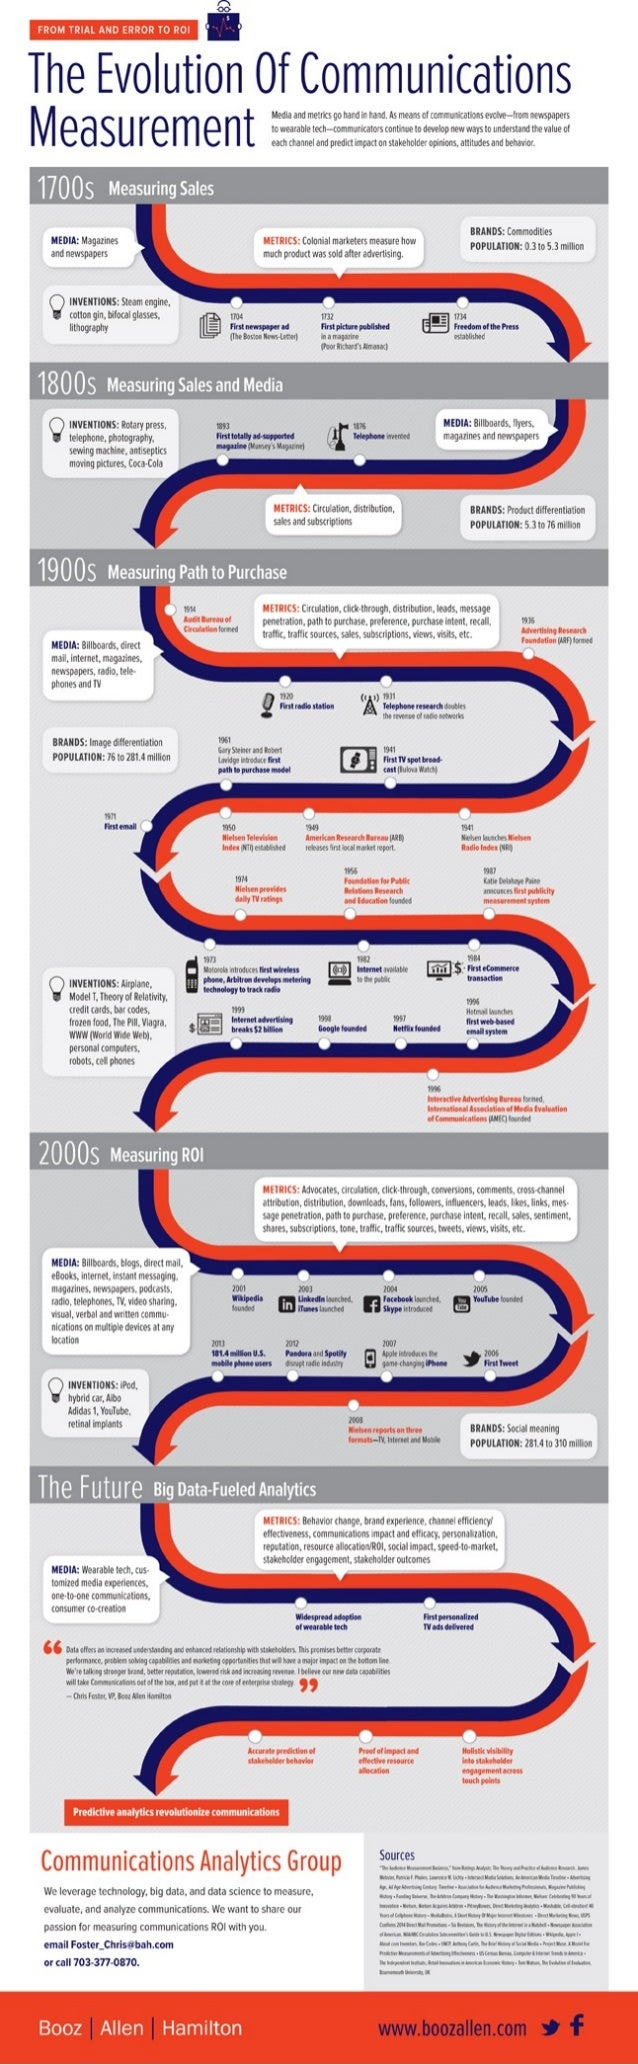 Evolution of Communications Measurement Infographic